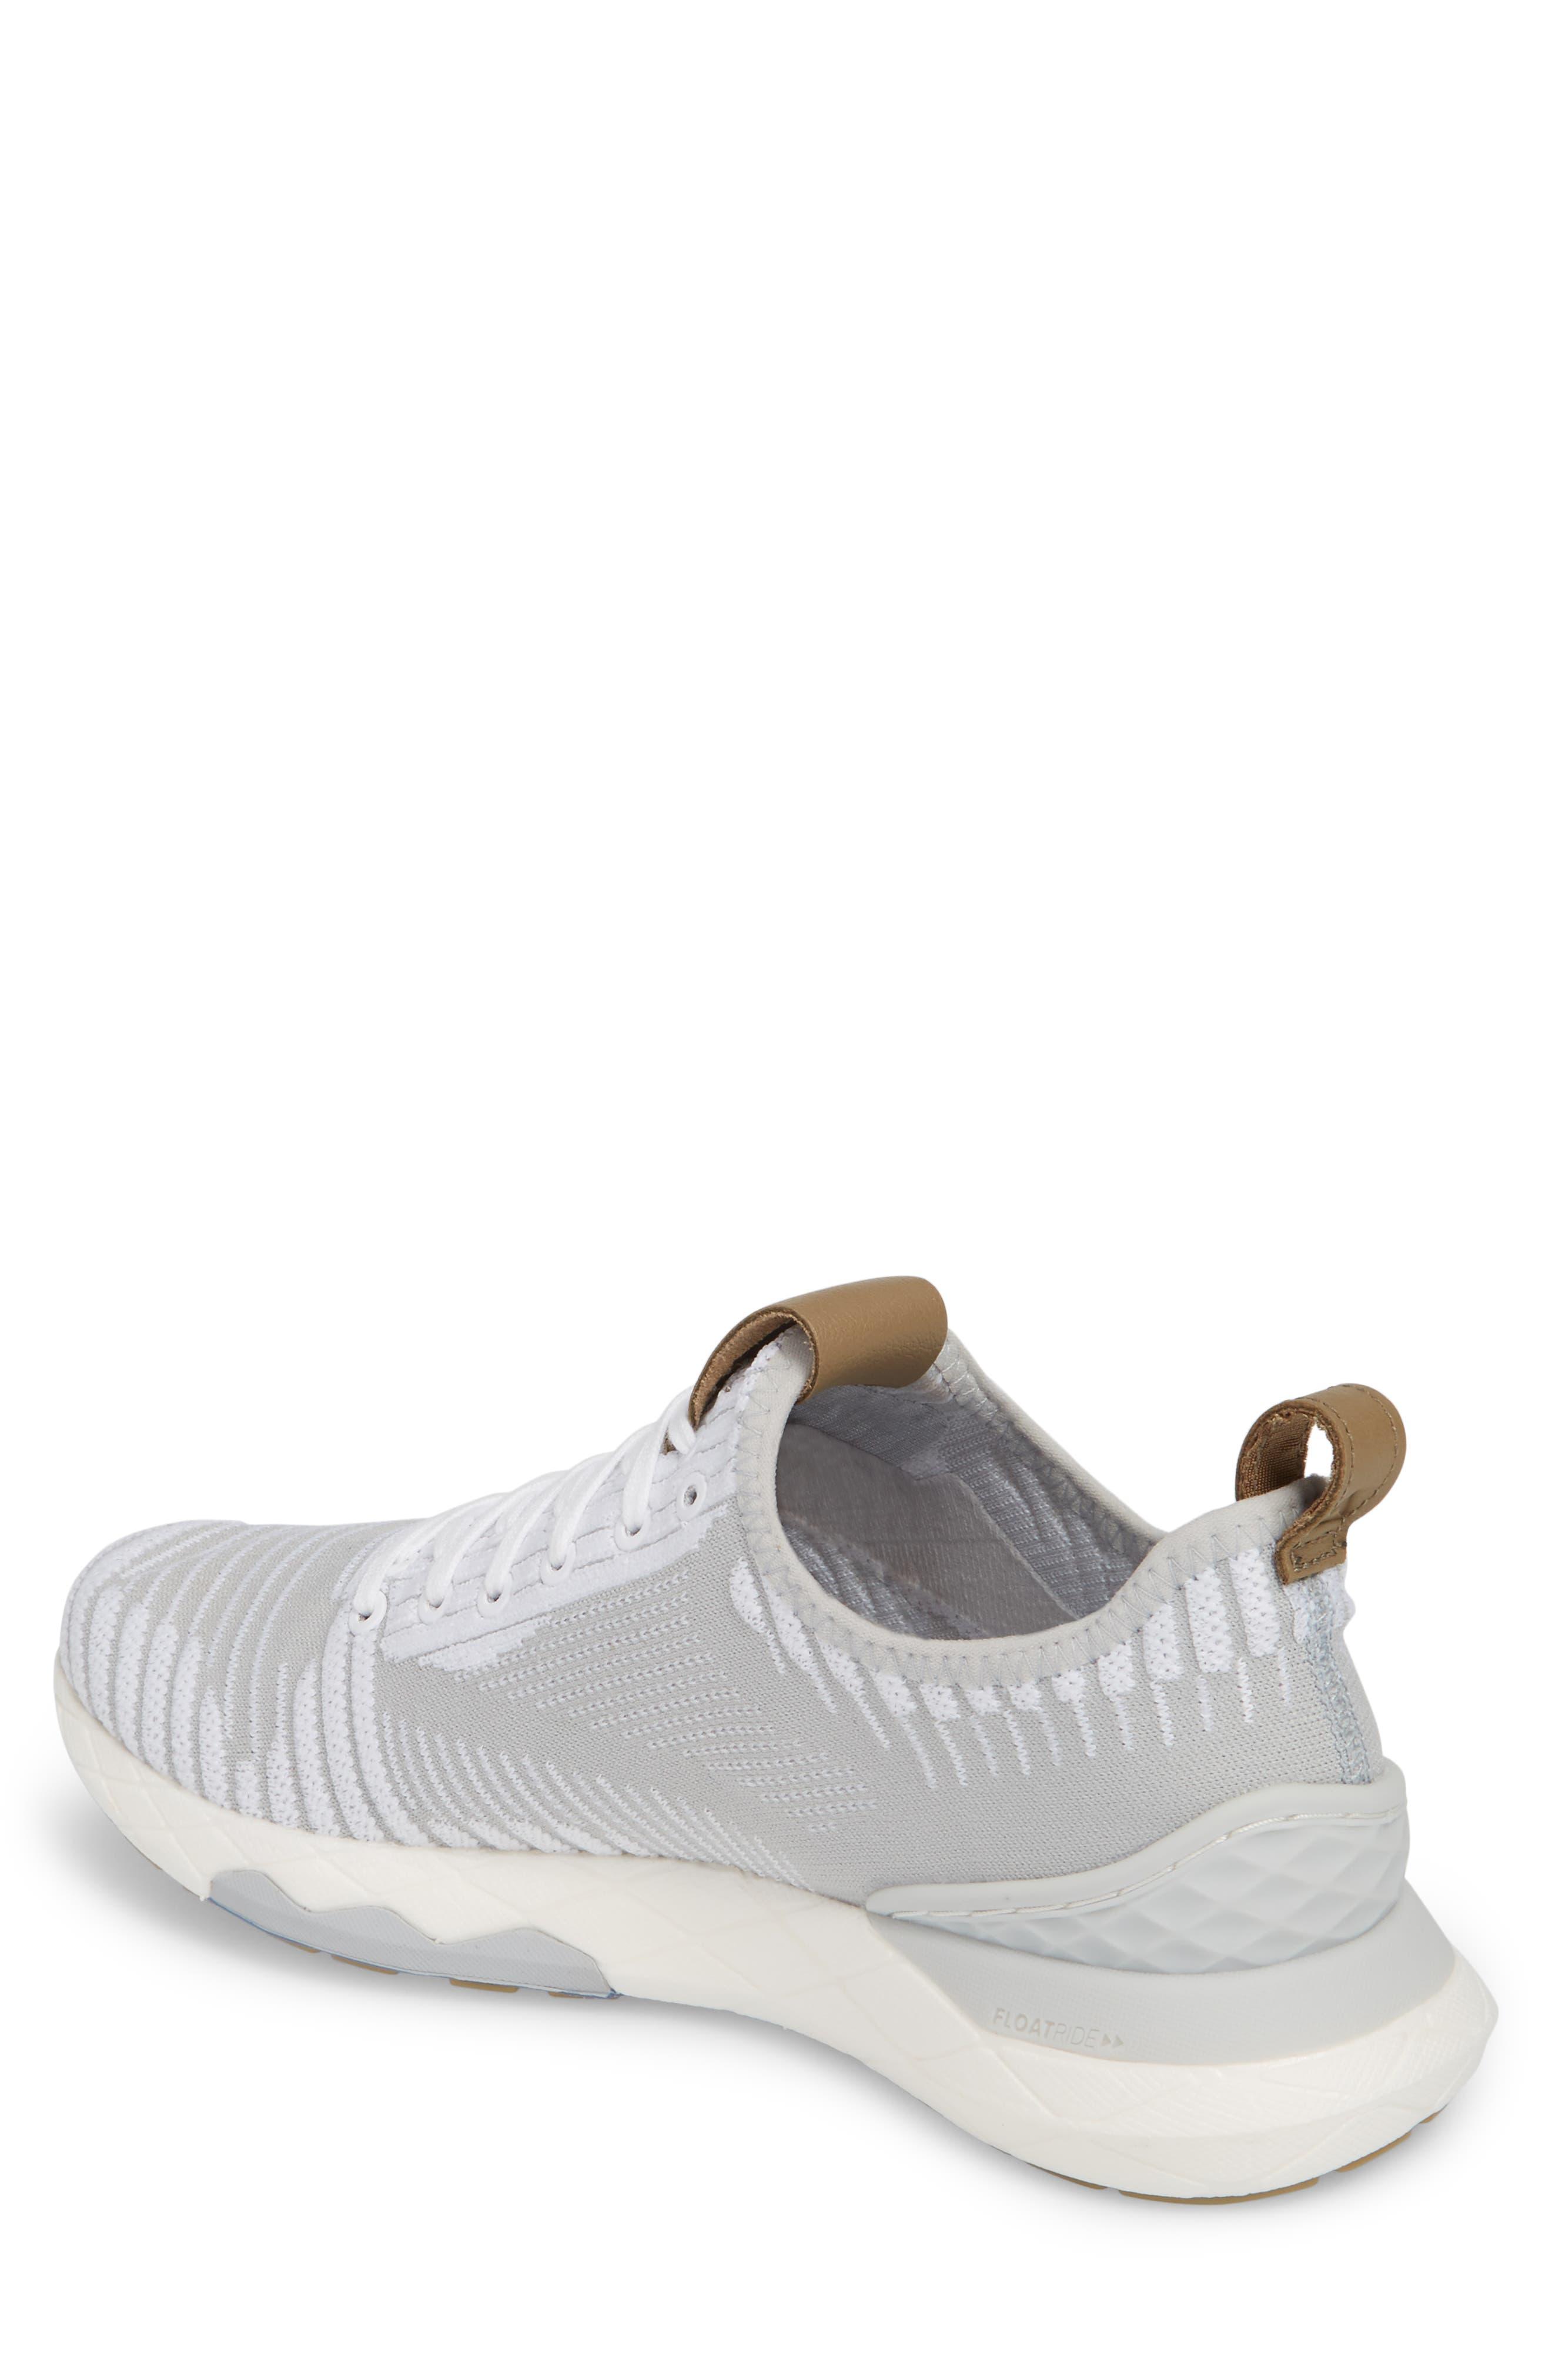 Floatride Run 6000 Running Shoe,                             Alternate thumbnail 9, color,